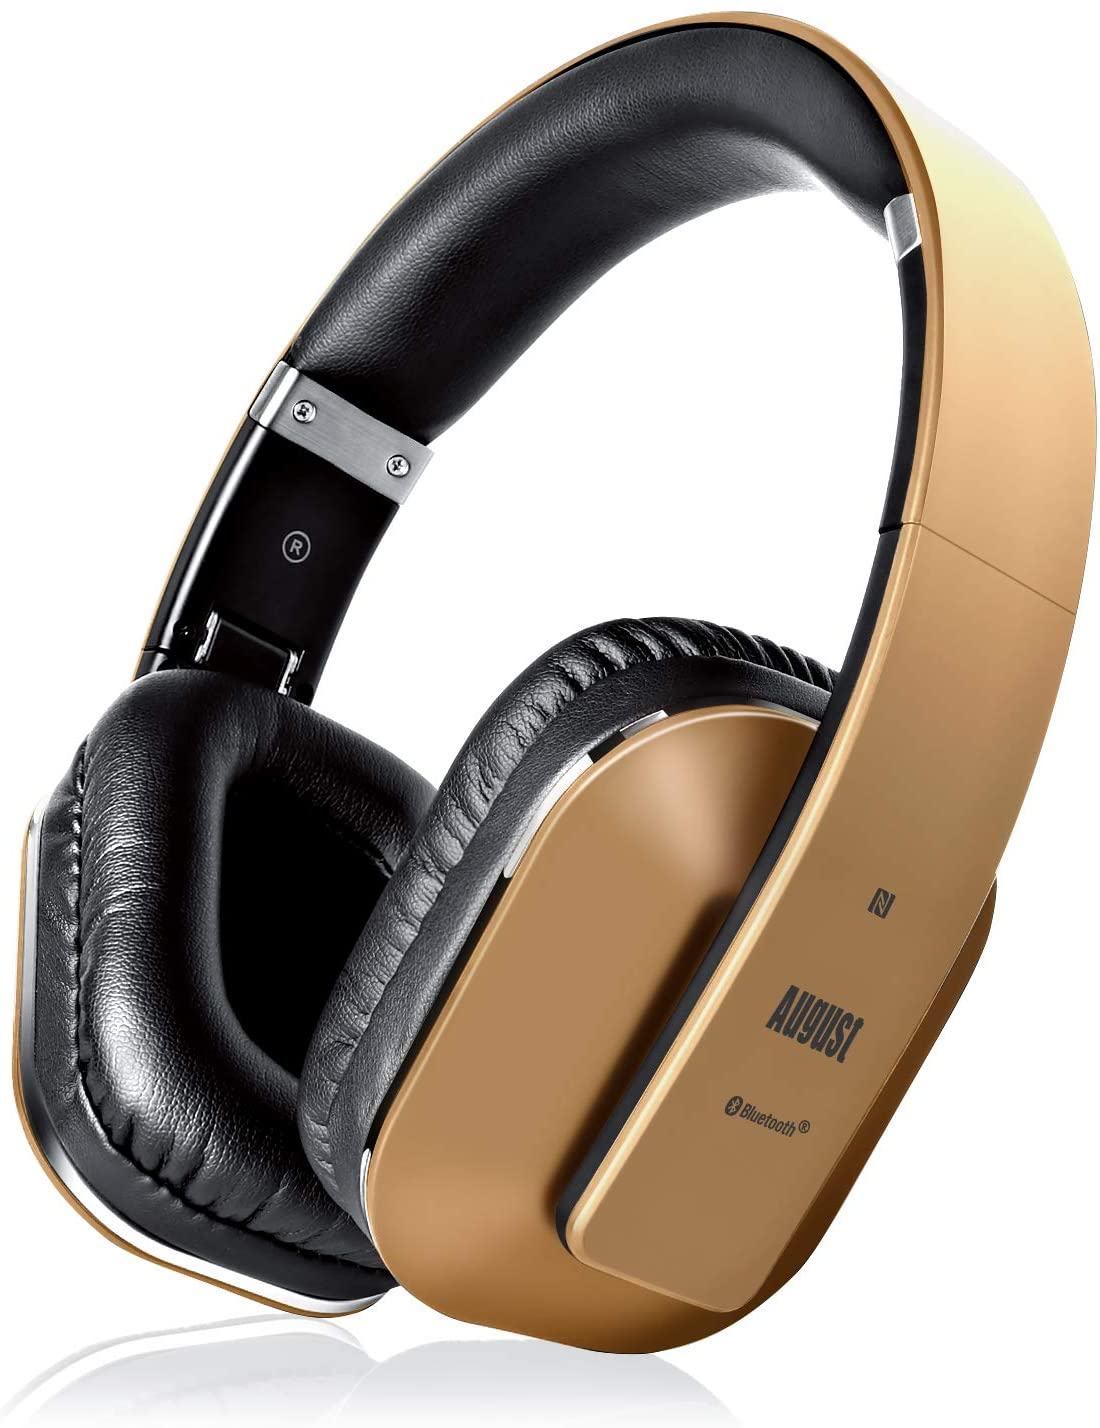 August Wireless Bluetooth Headphones